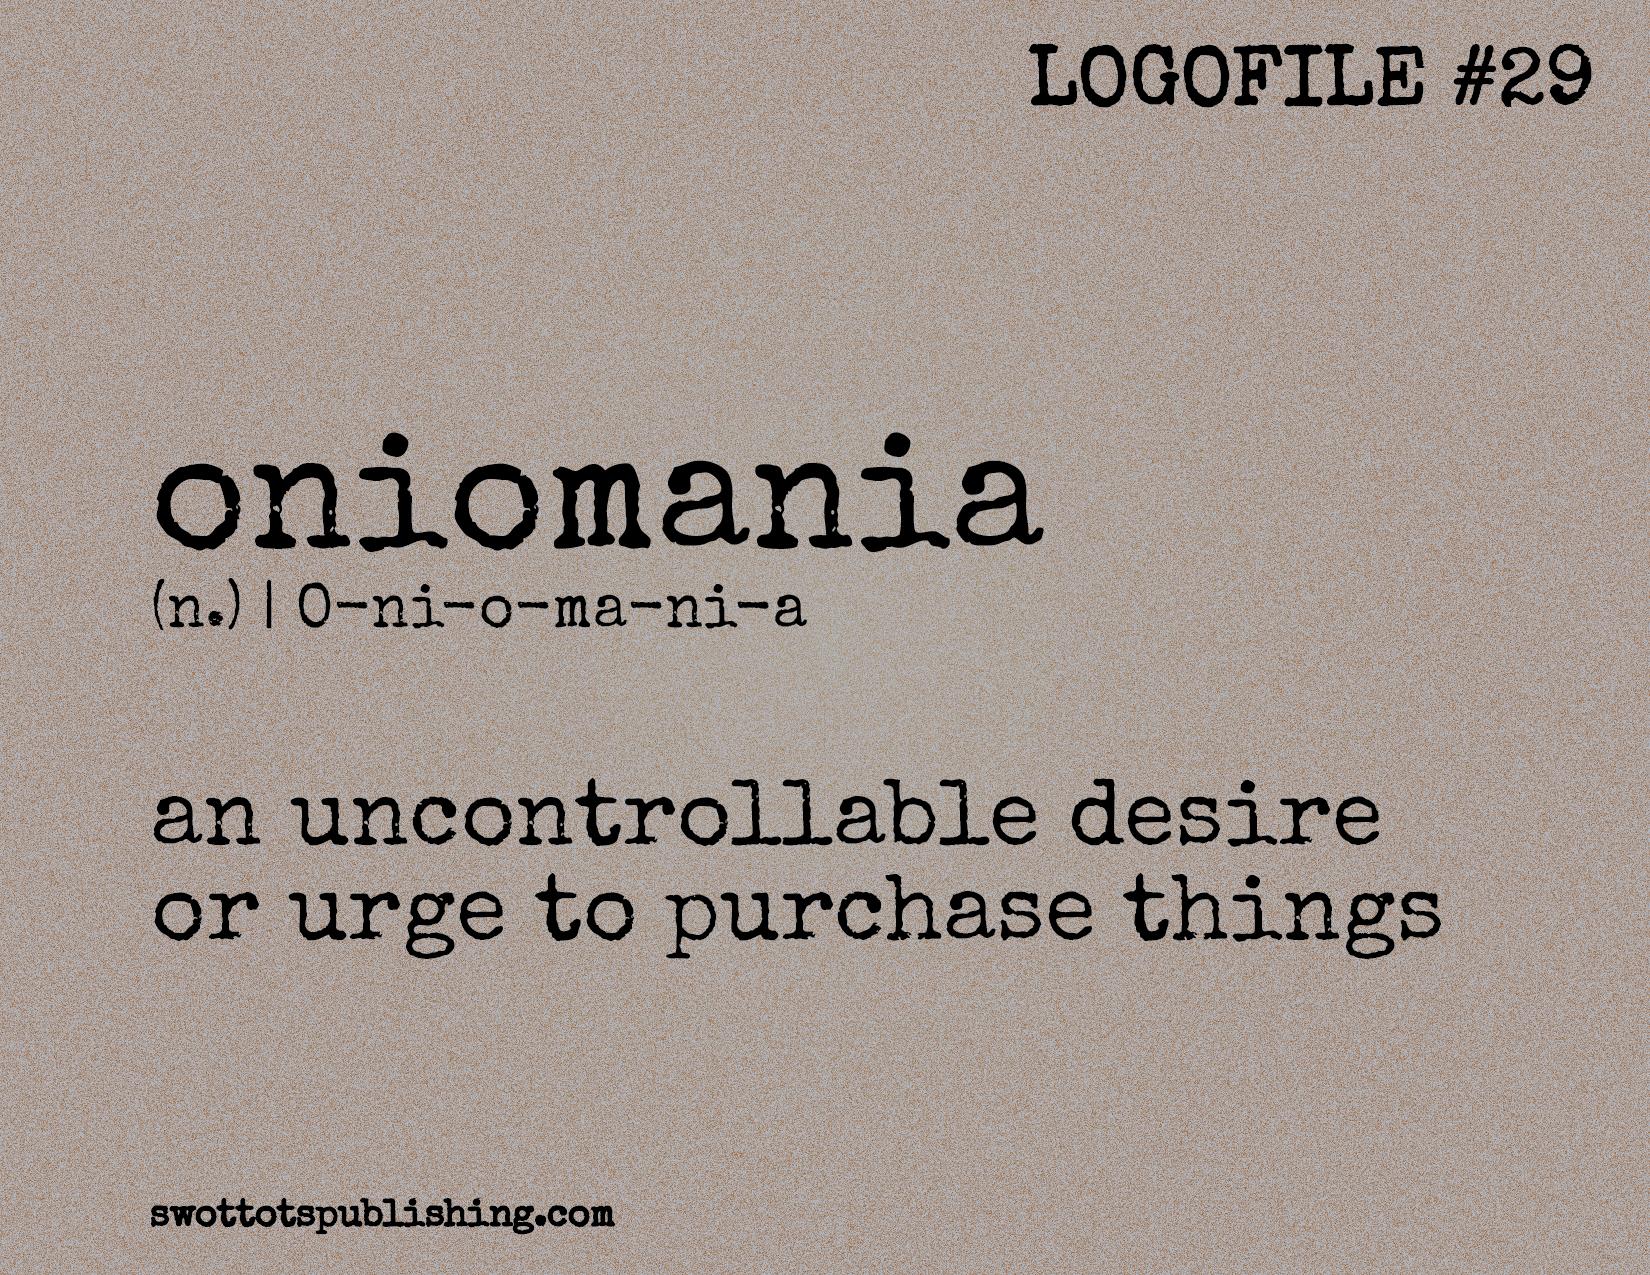 STP Logofile #29 | oniomania (n.)